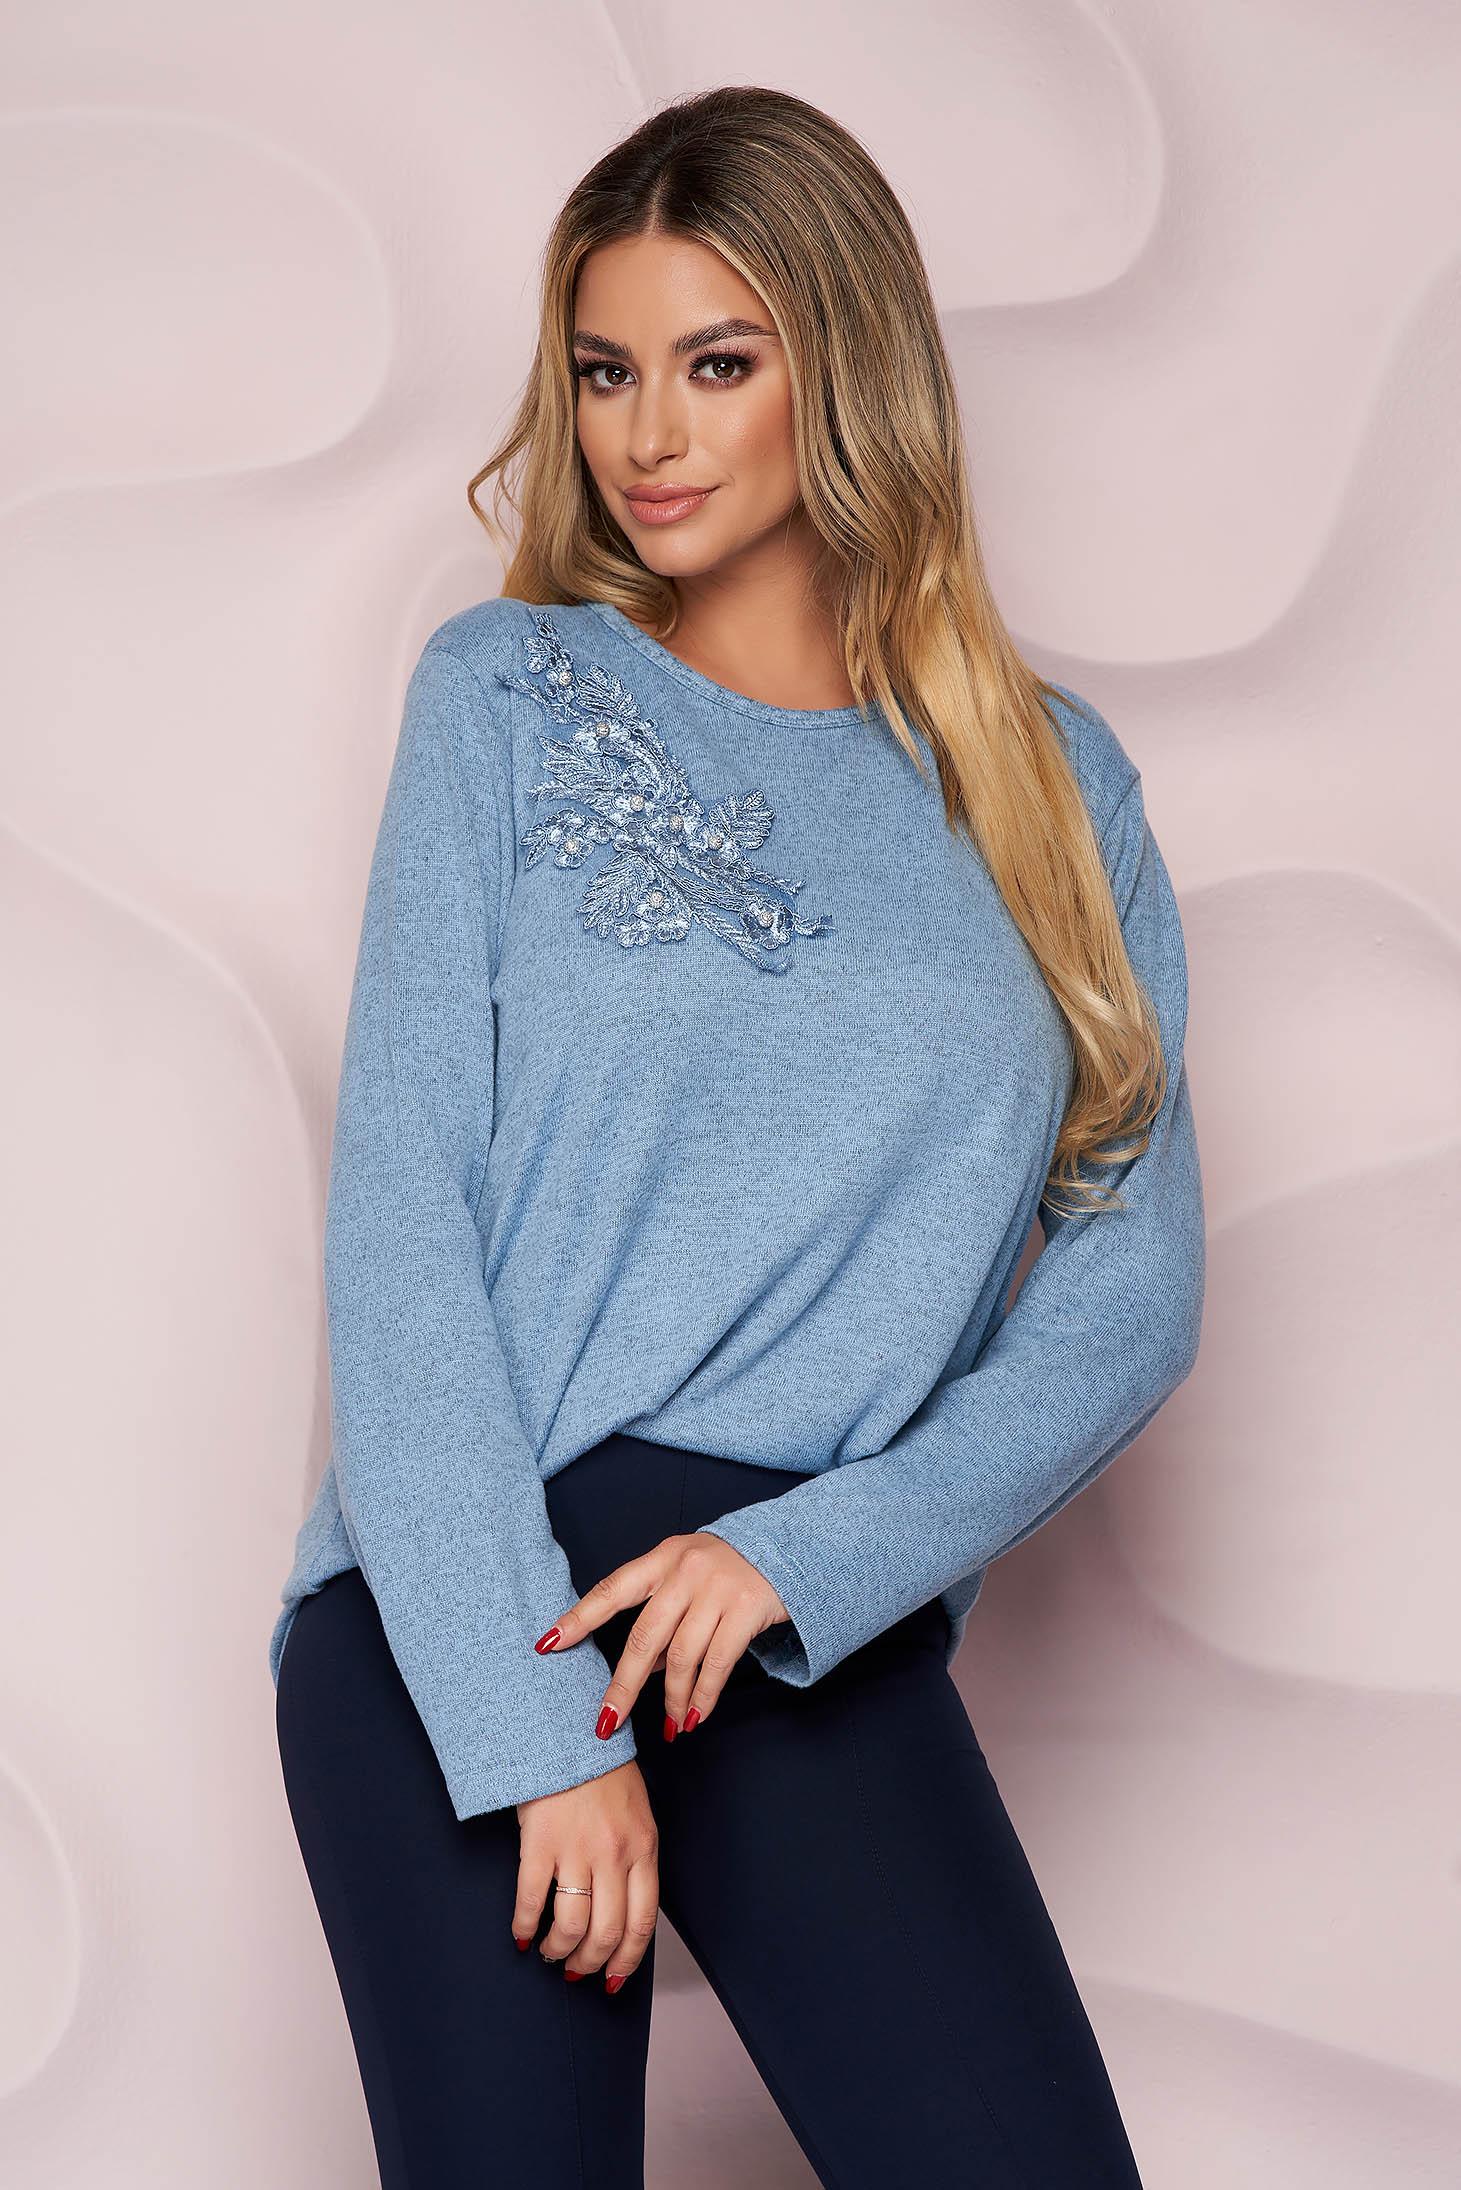 Pulover Lady Pandora albastru-inchis office cu croi larg din material tricotat elastic si subtire si broderie florala